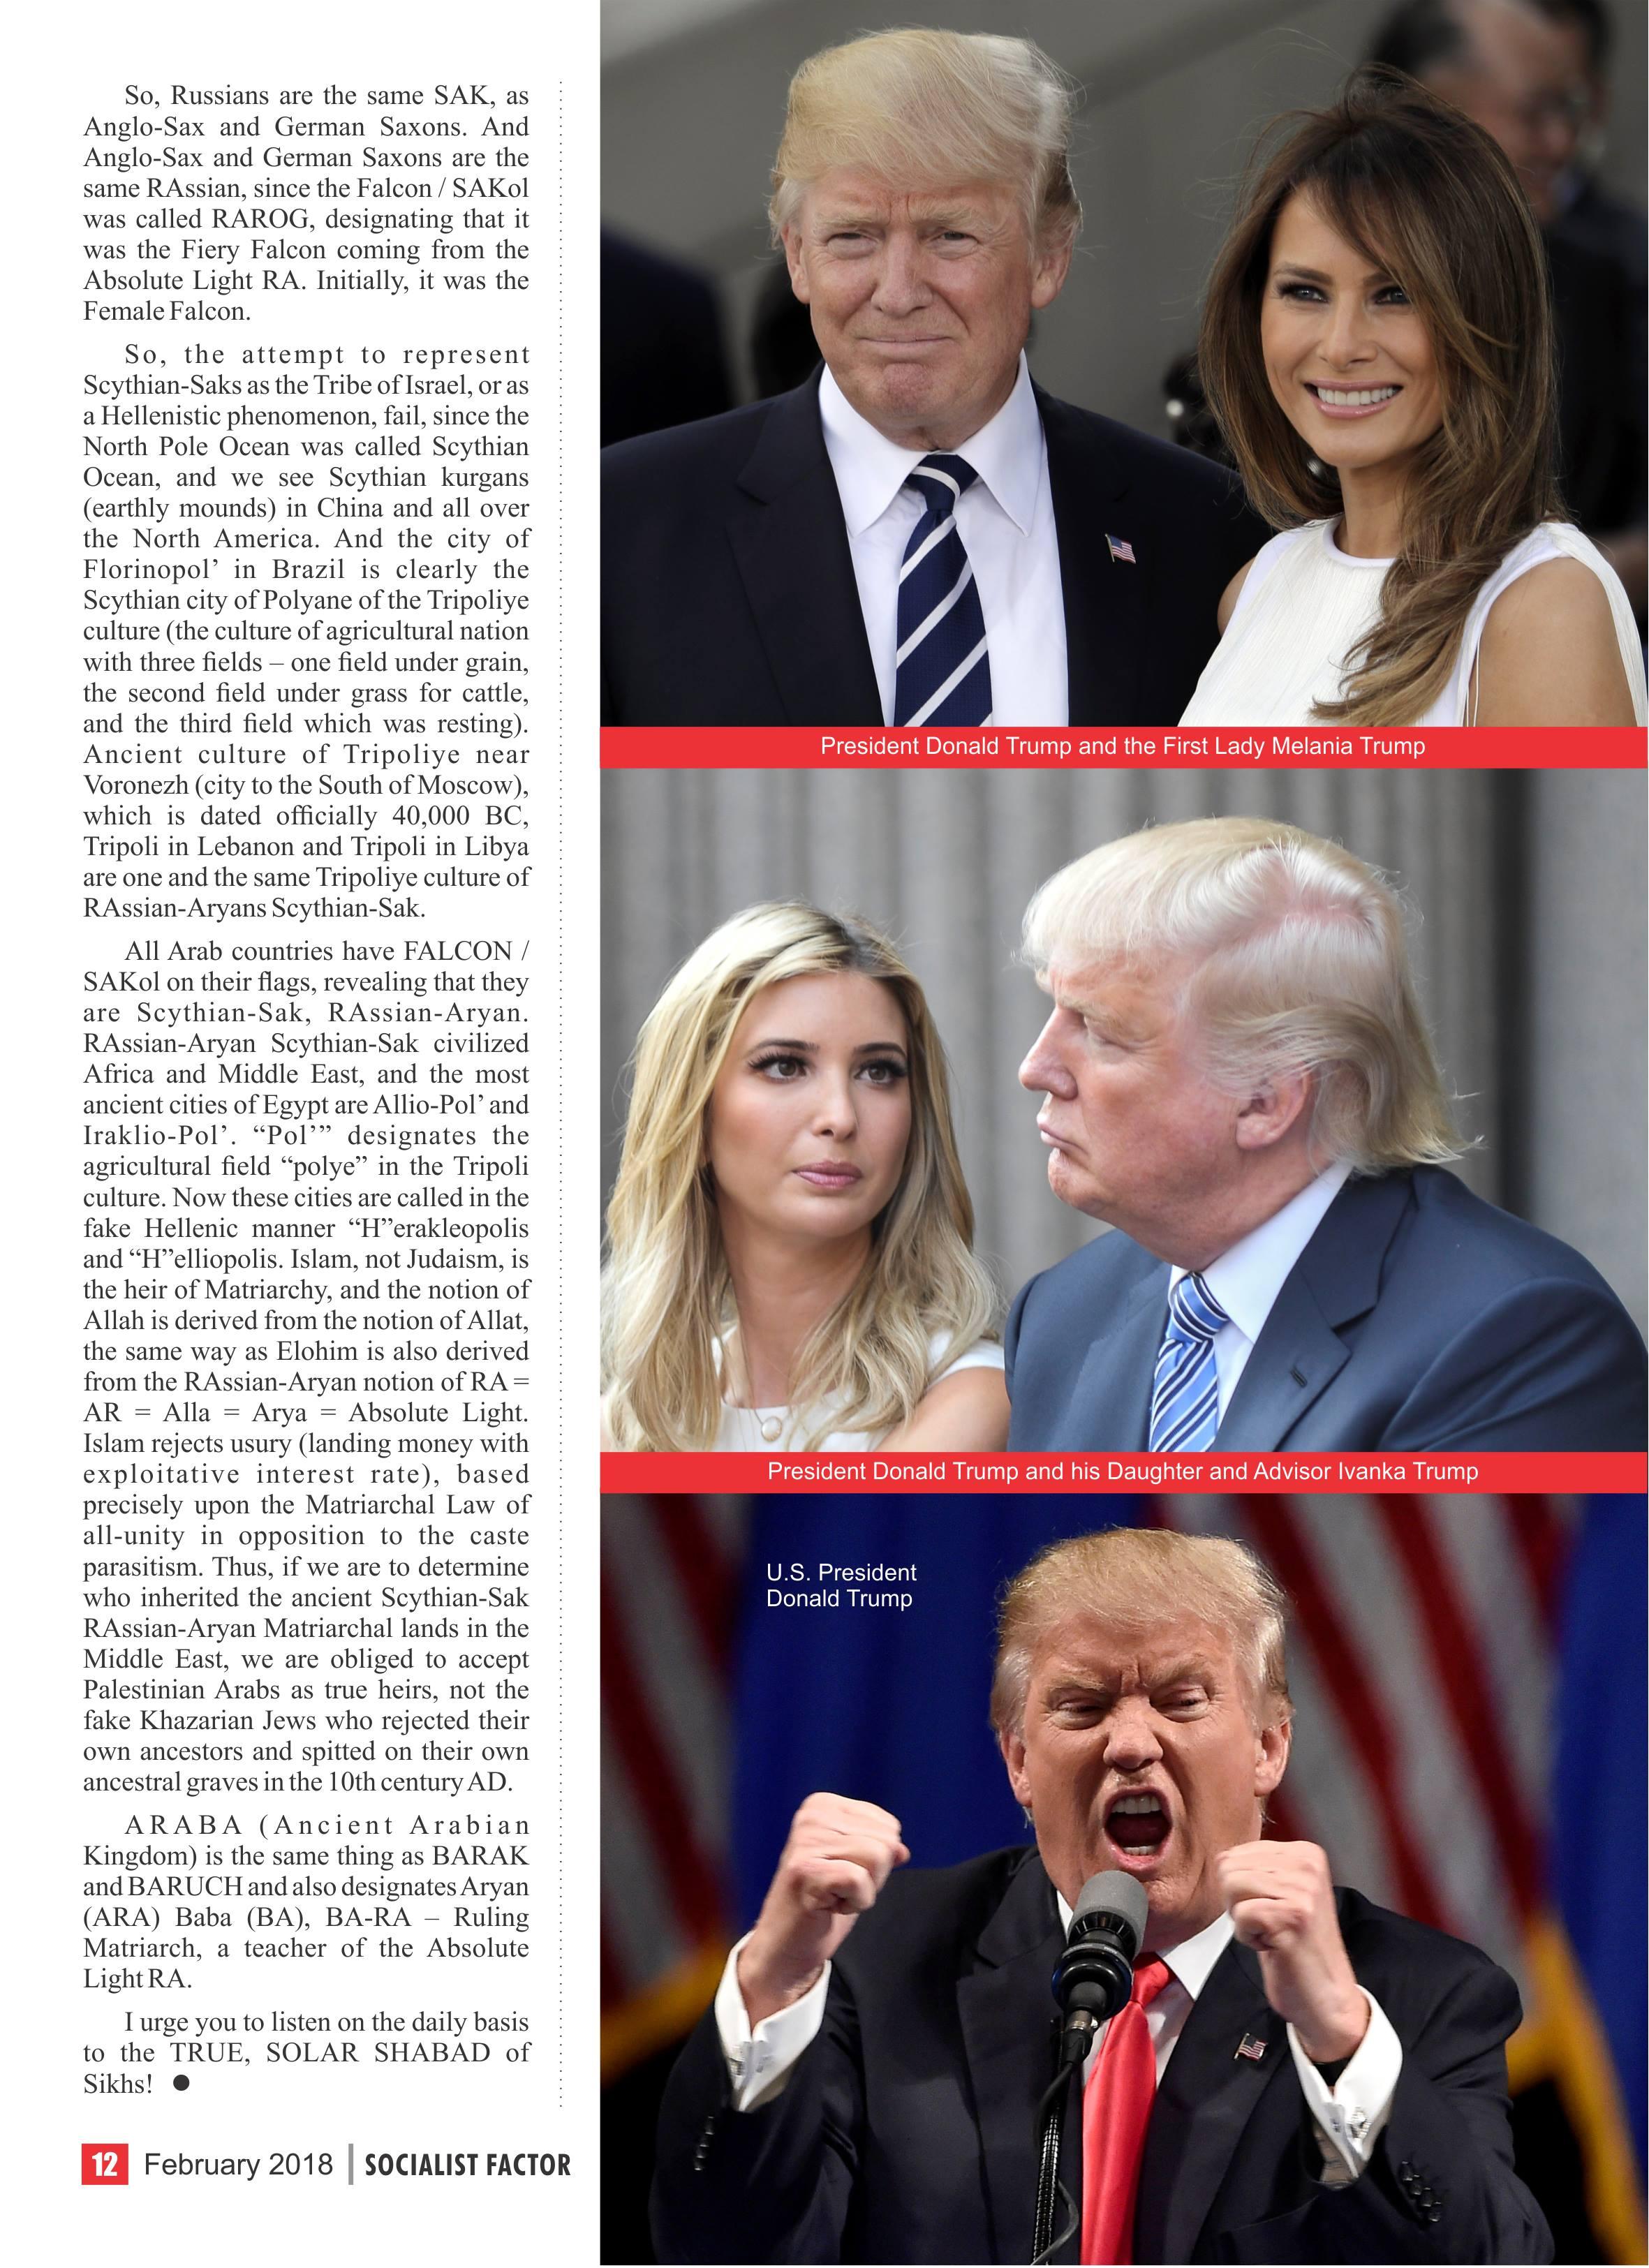 2018_2_IRENE_CAESAR_IS_TRUMP_DEFENDING_AMERICAN_NATIONAL_INTERESTS_7